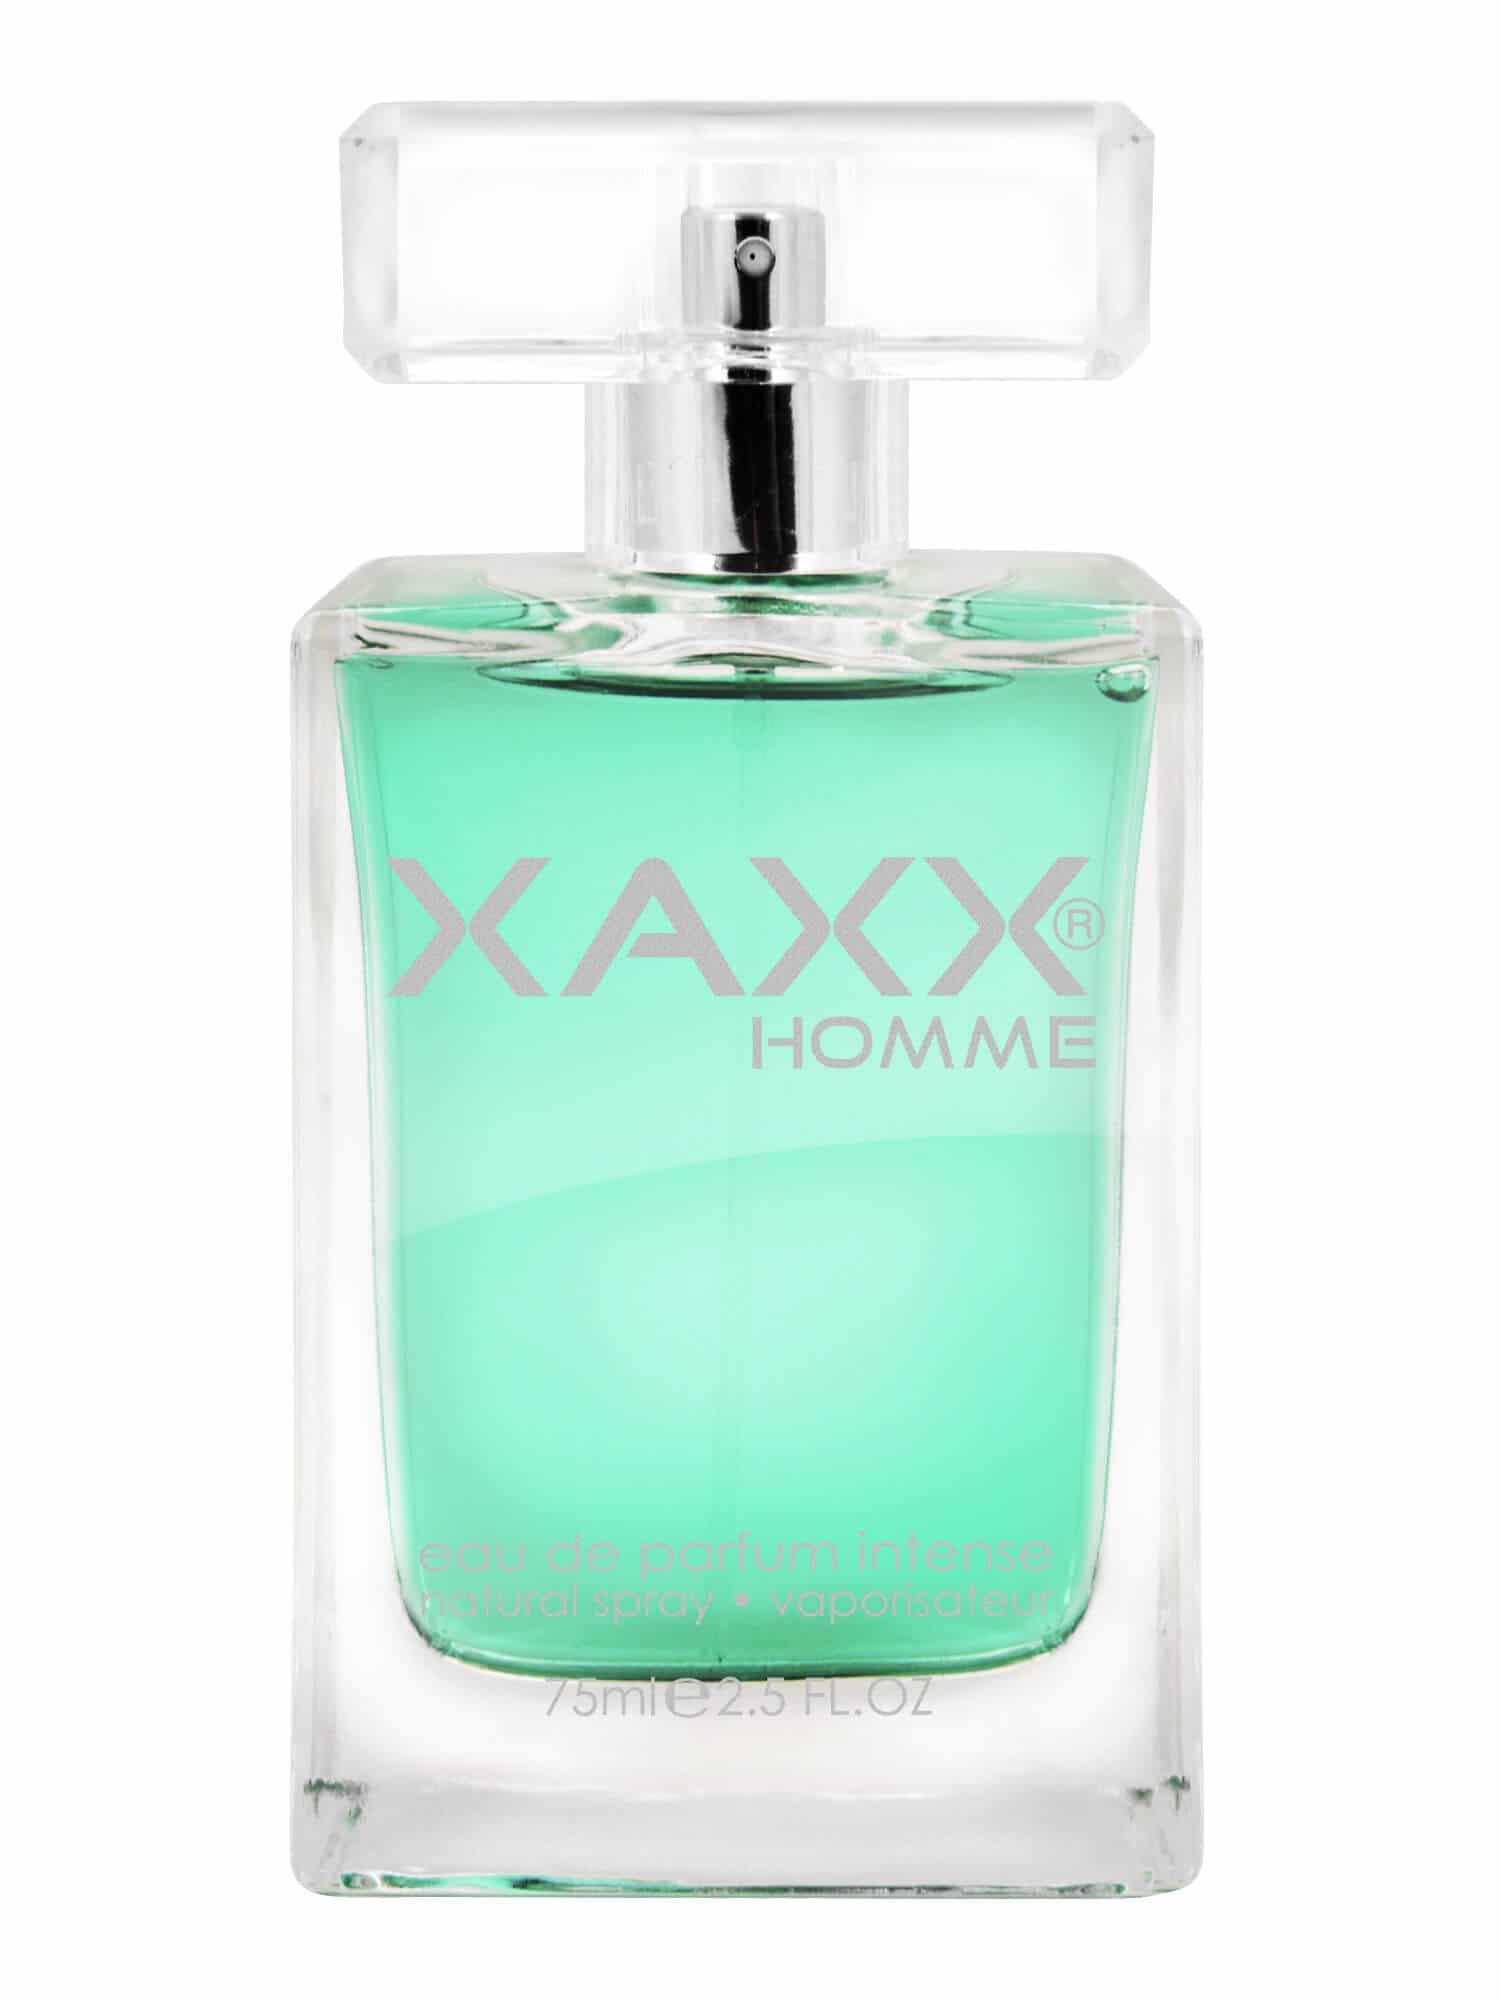 XAXX Herrenduft ONE intense 75ml